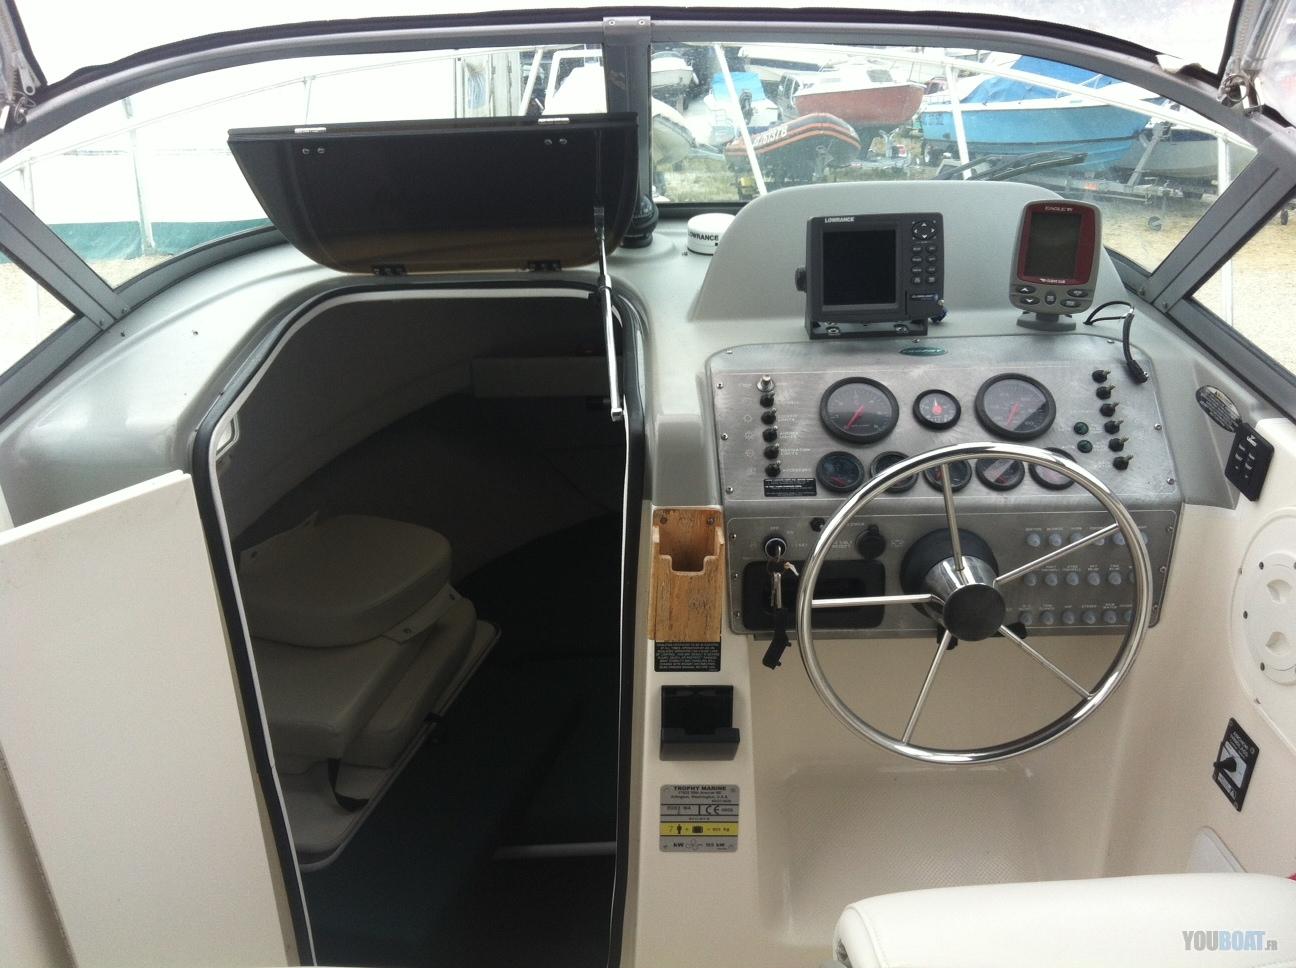 I Am Upgrading My Gps  Fishfinder On My Bayliner Trophy 2052